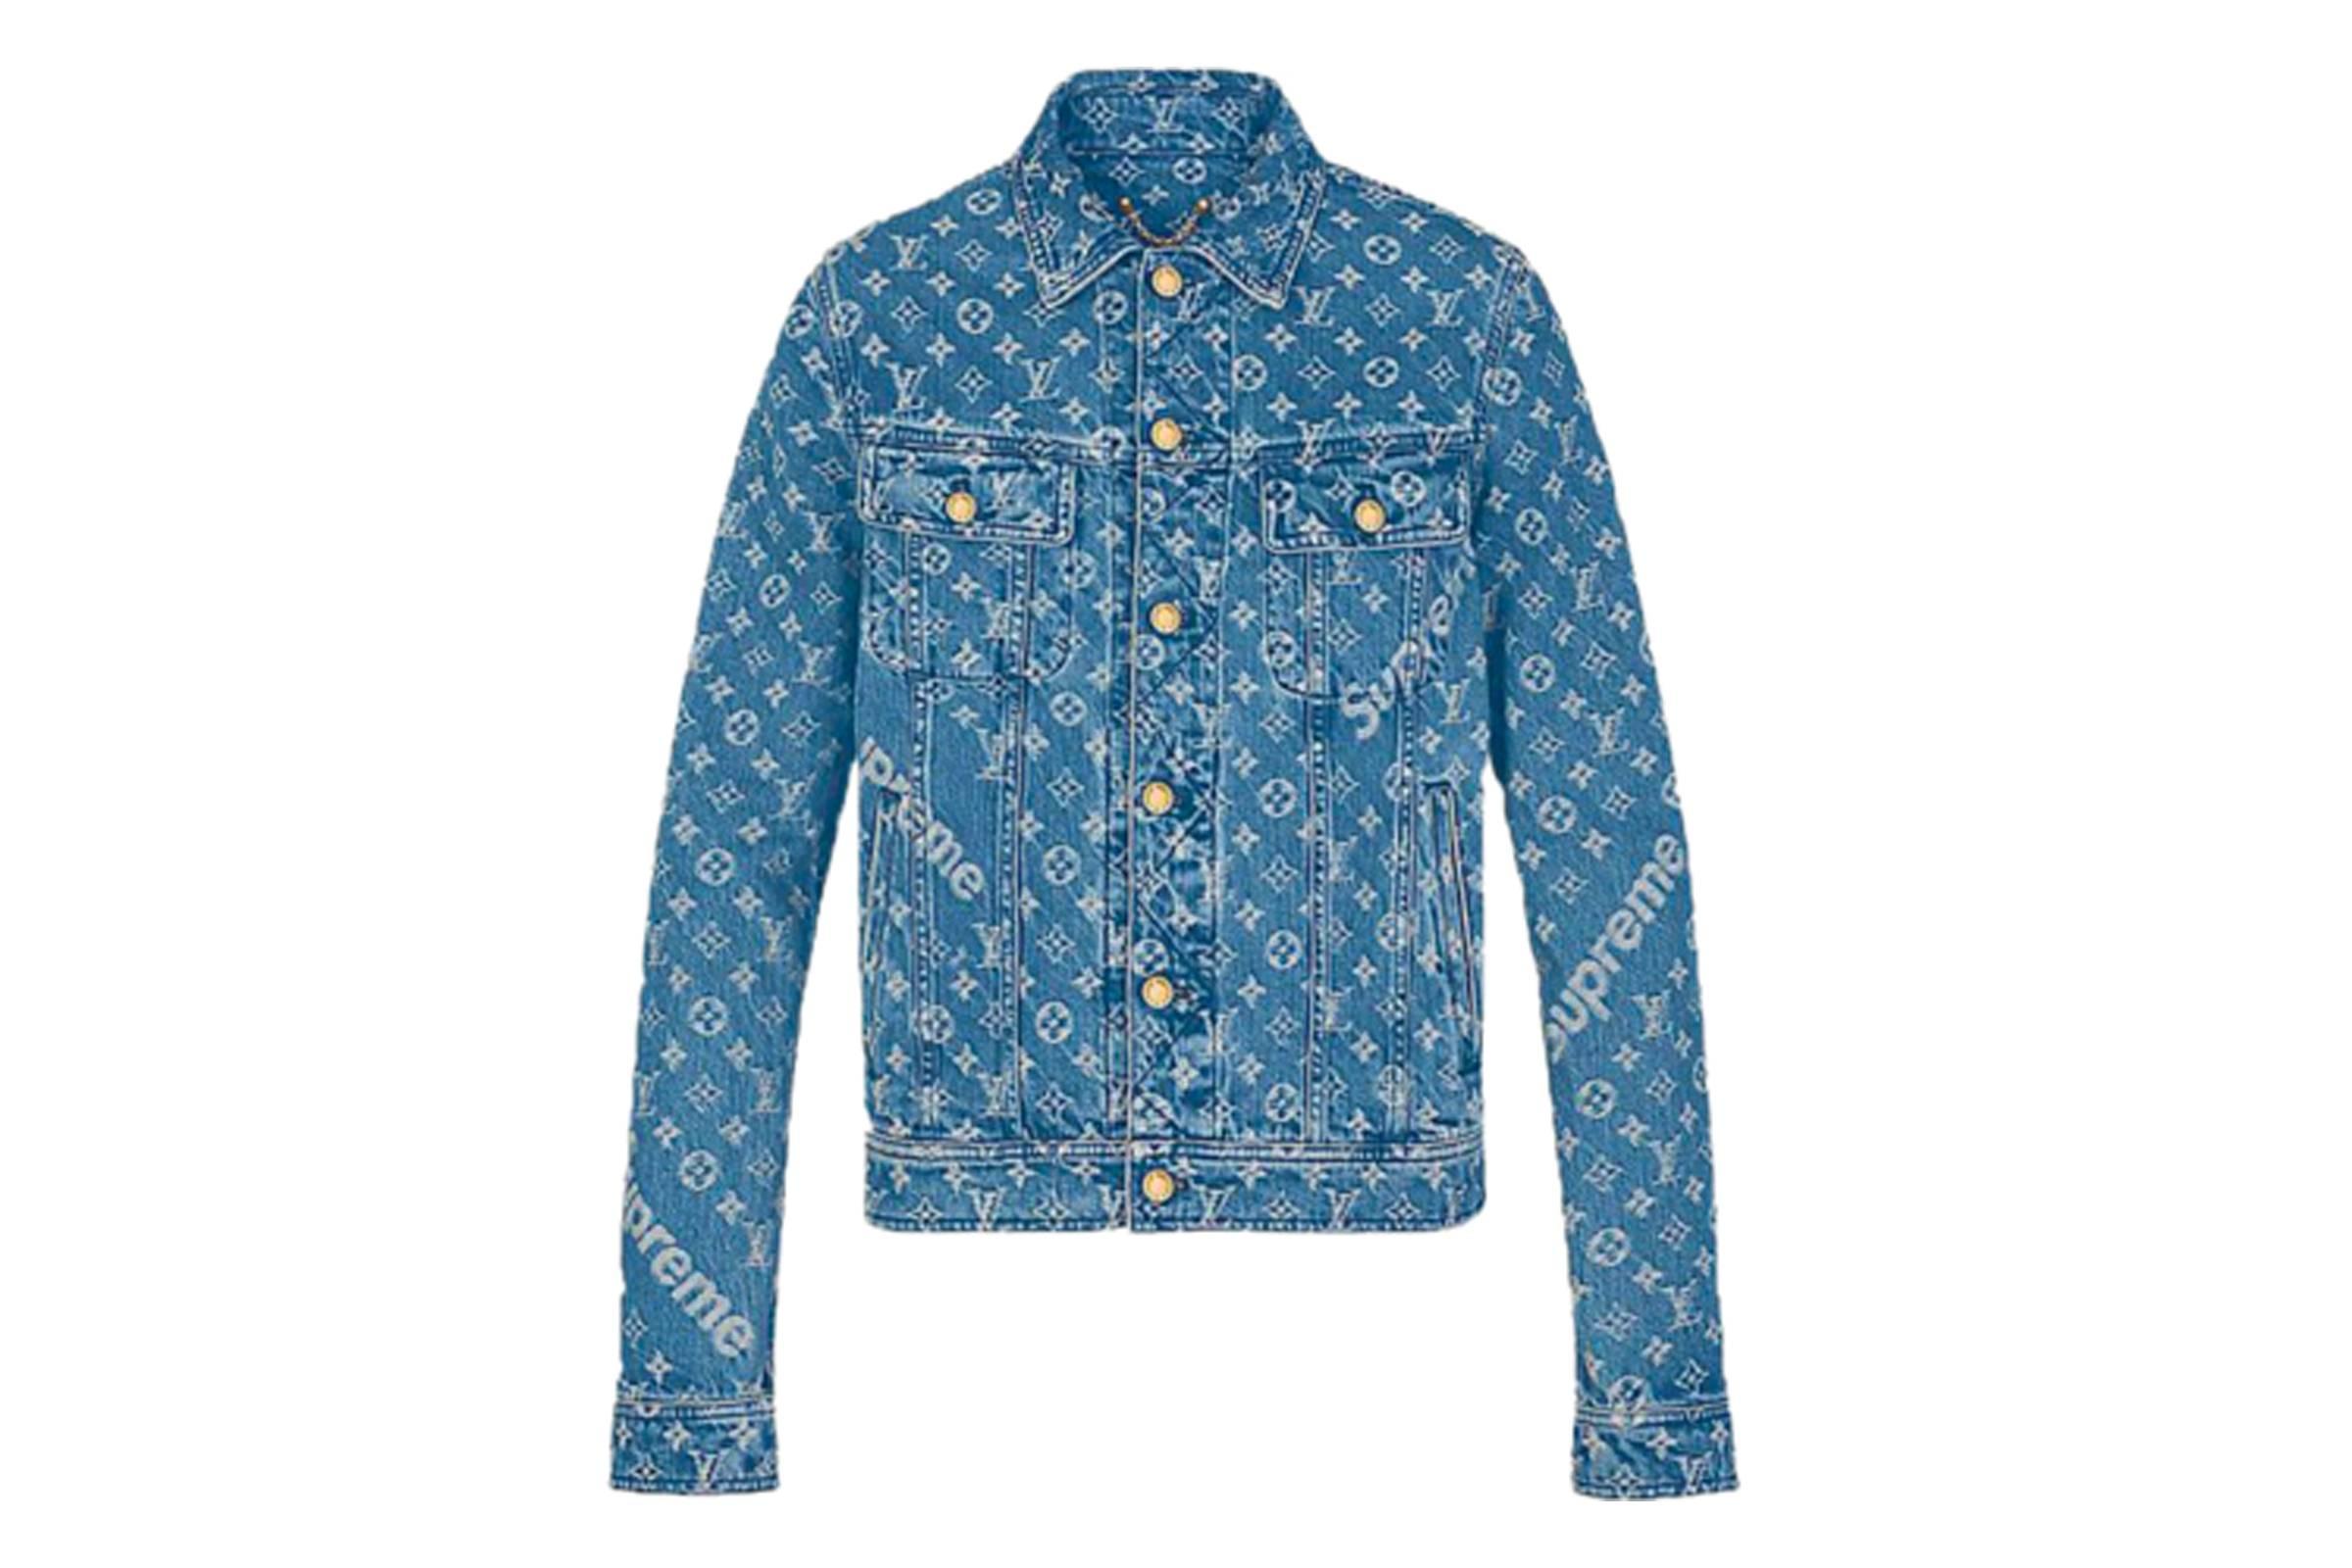 Louis Vuitton x Supreme Jacquard Denim Trucker Jacket